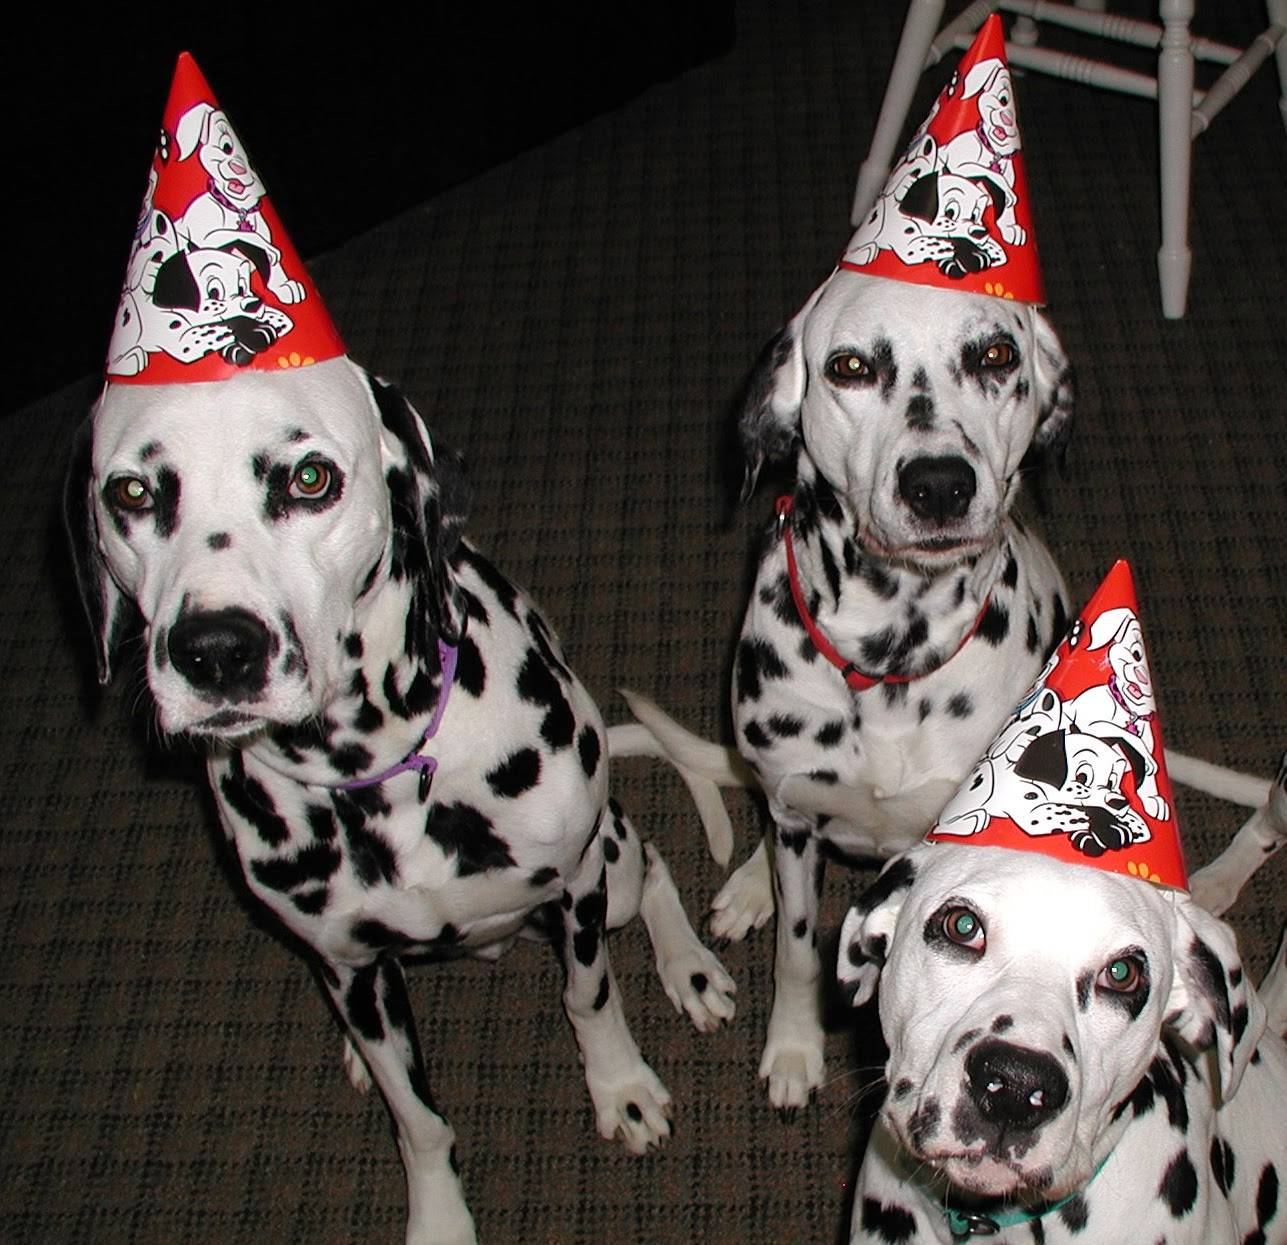 Happy+Birthday+Dalmatian+image best birthday cake hd pic 3 on best birthday cake hd pic